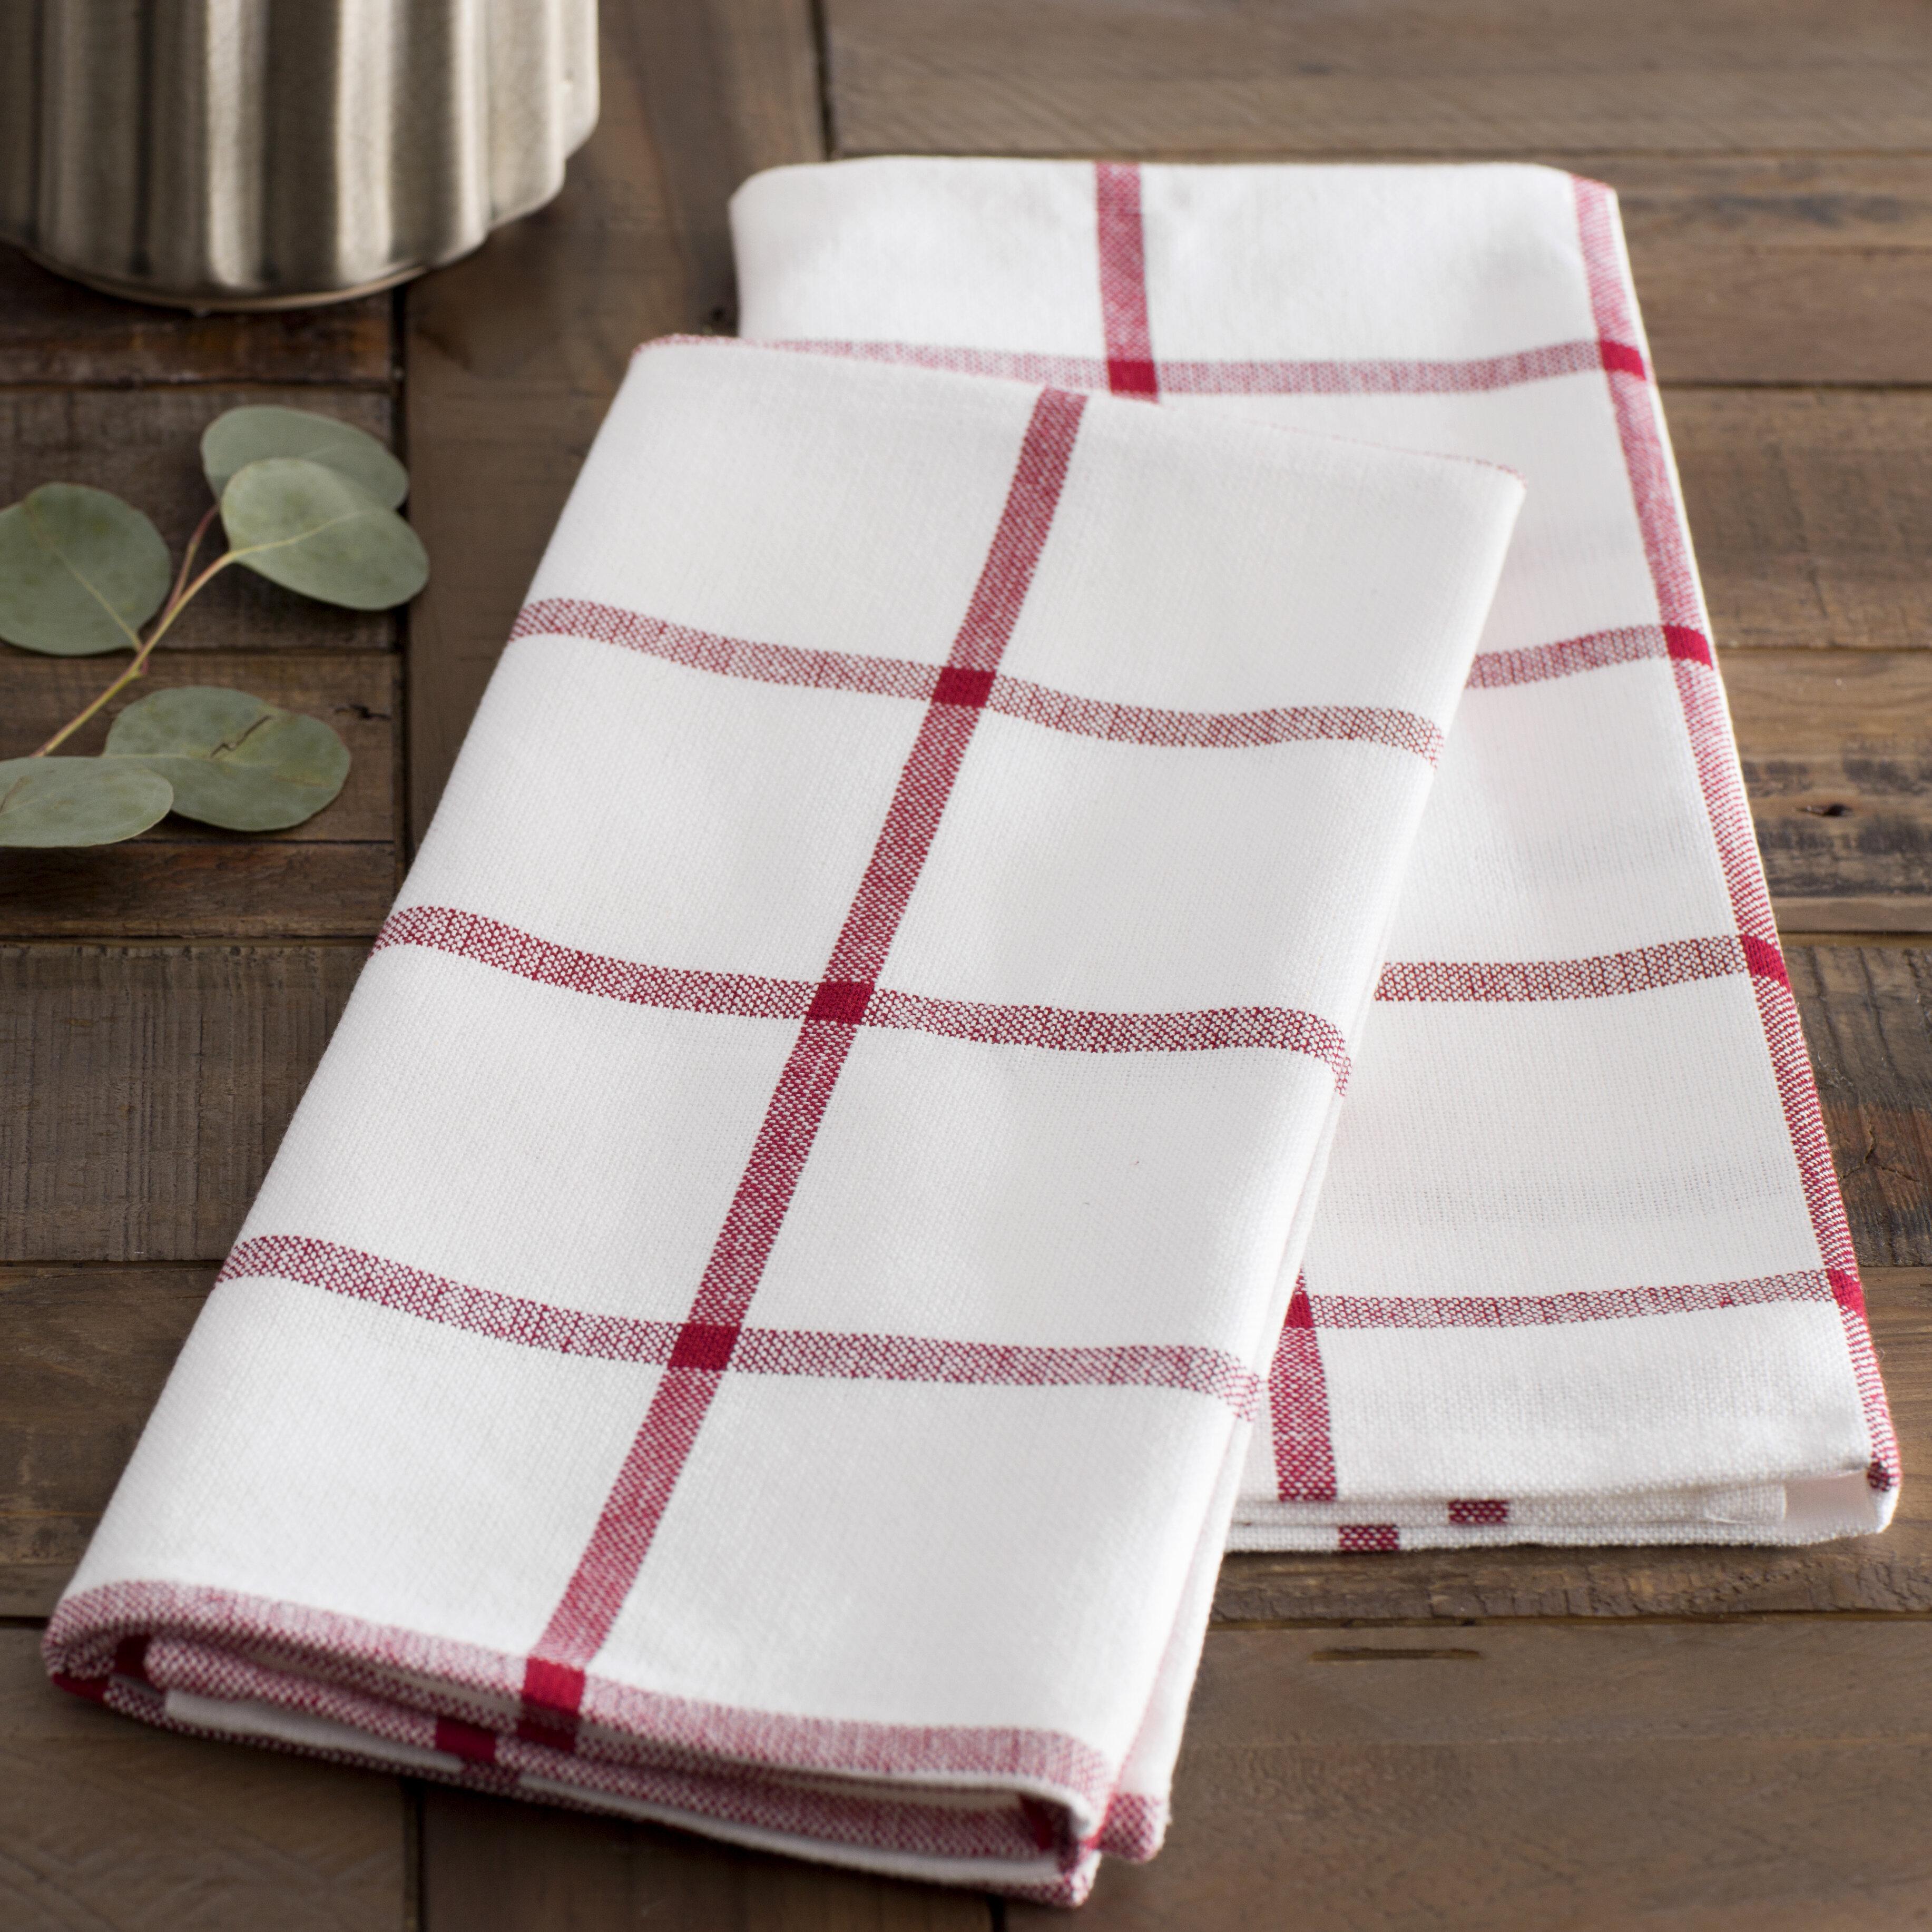 Mint Pantry Windowpane Kitchen Towel U0026 Reviews | Wayfair